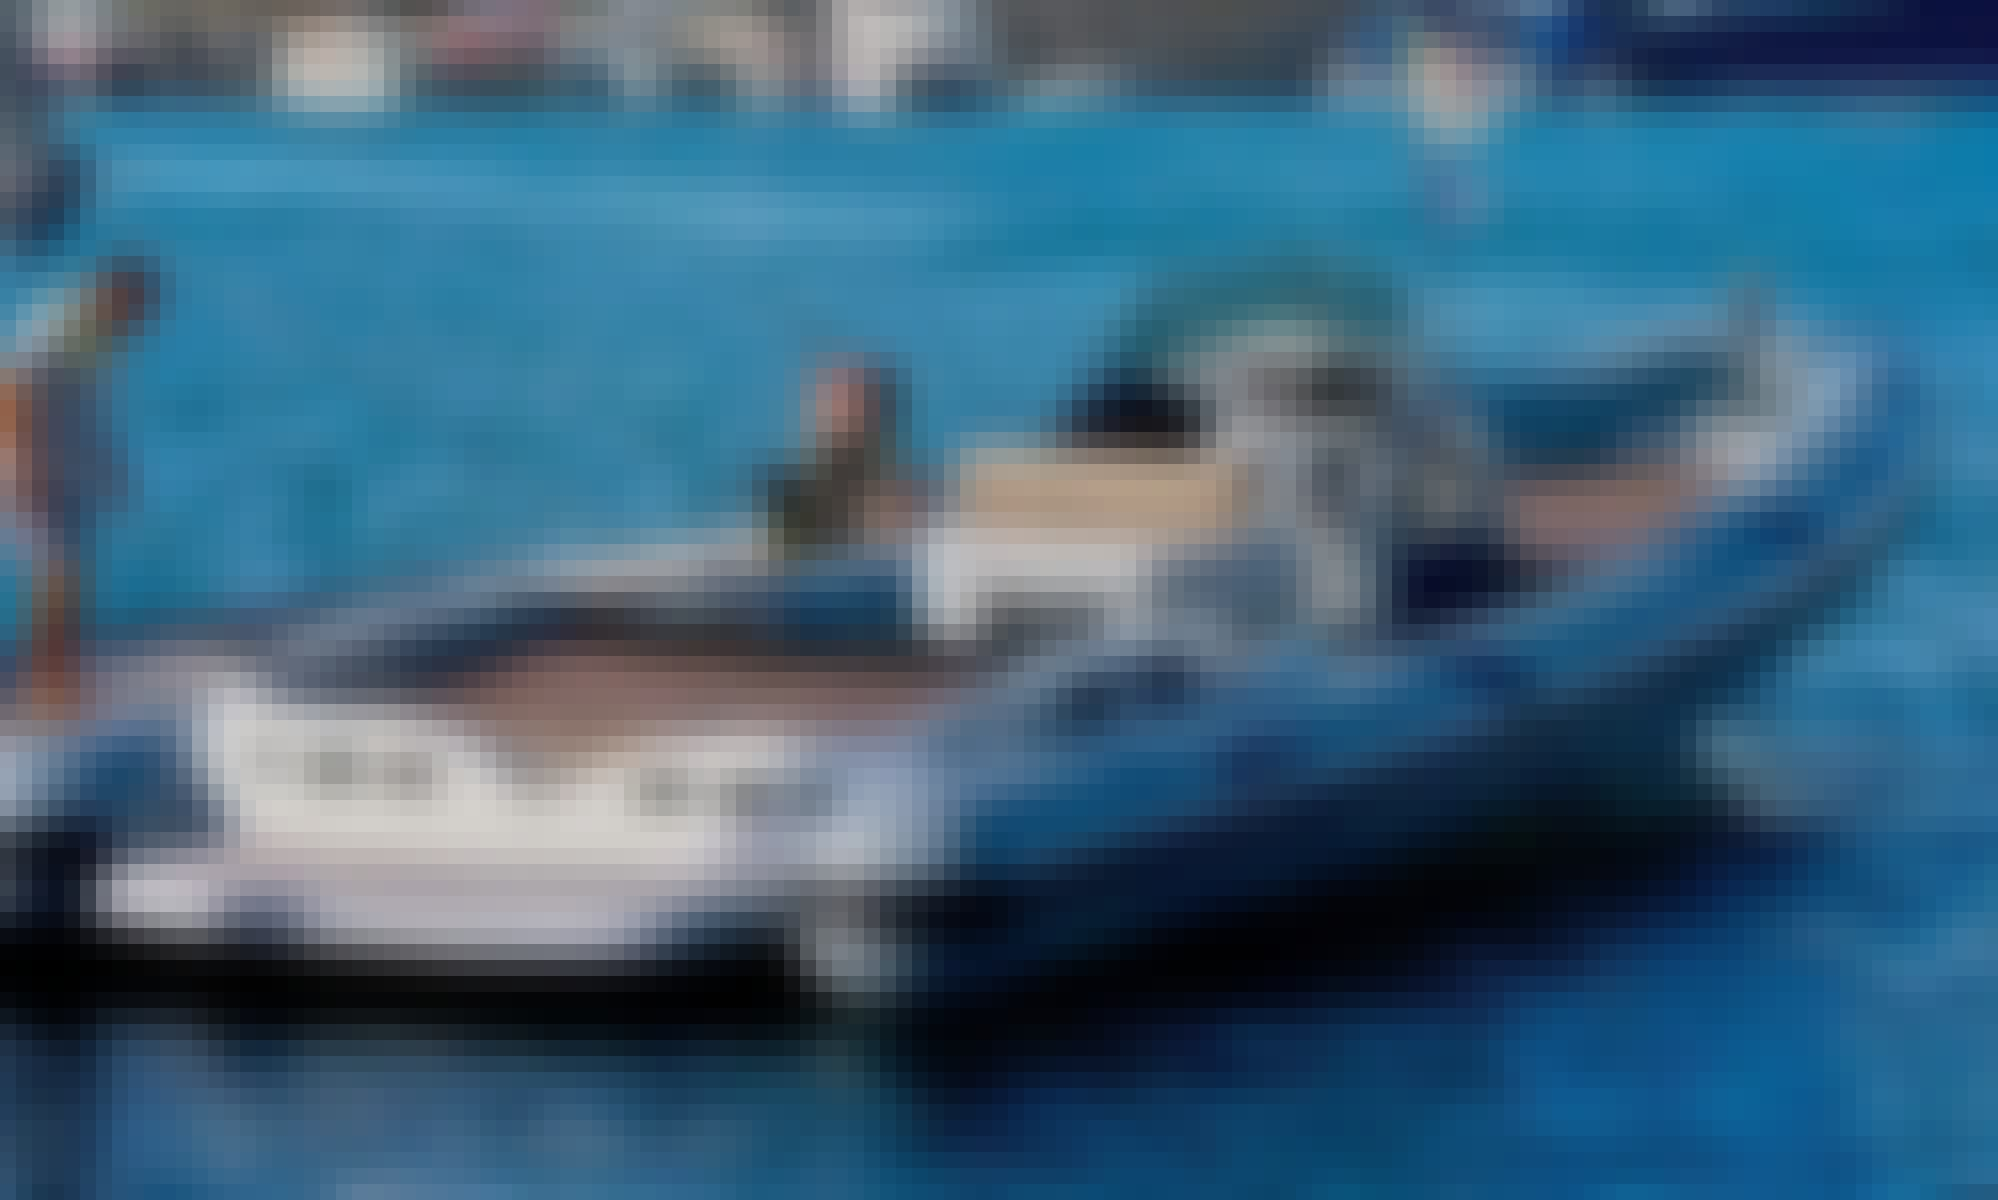 MEGA RIB BOAT, Ultimate Speed Powerboat Experience in IBIZA, Spain